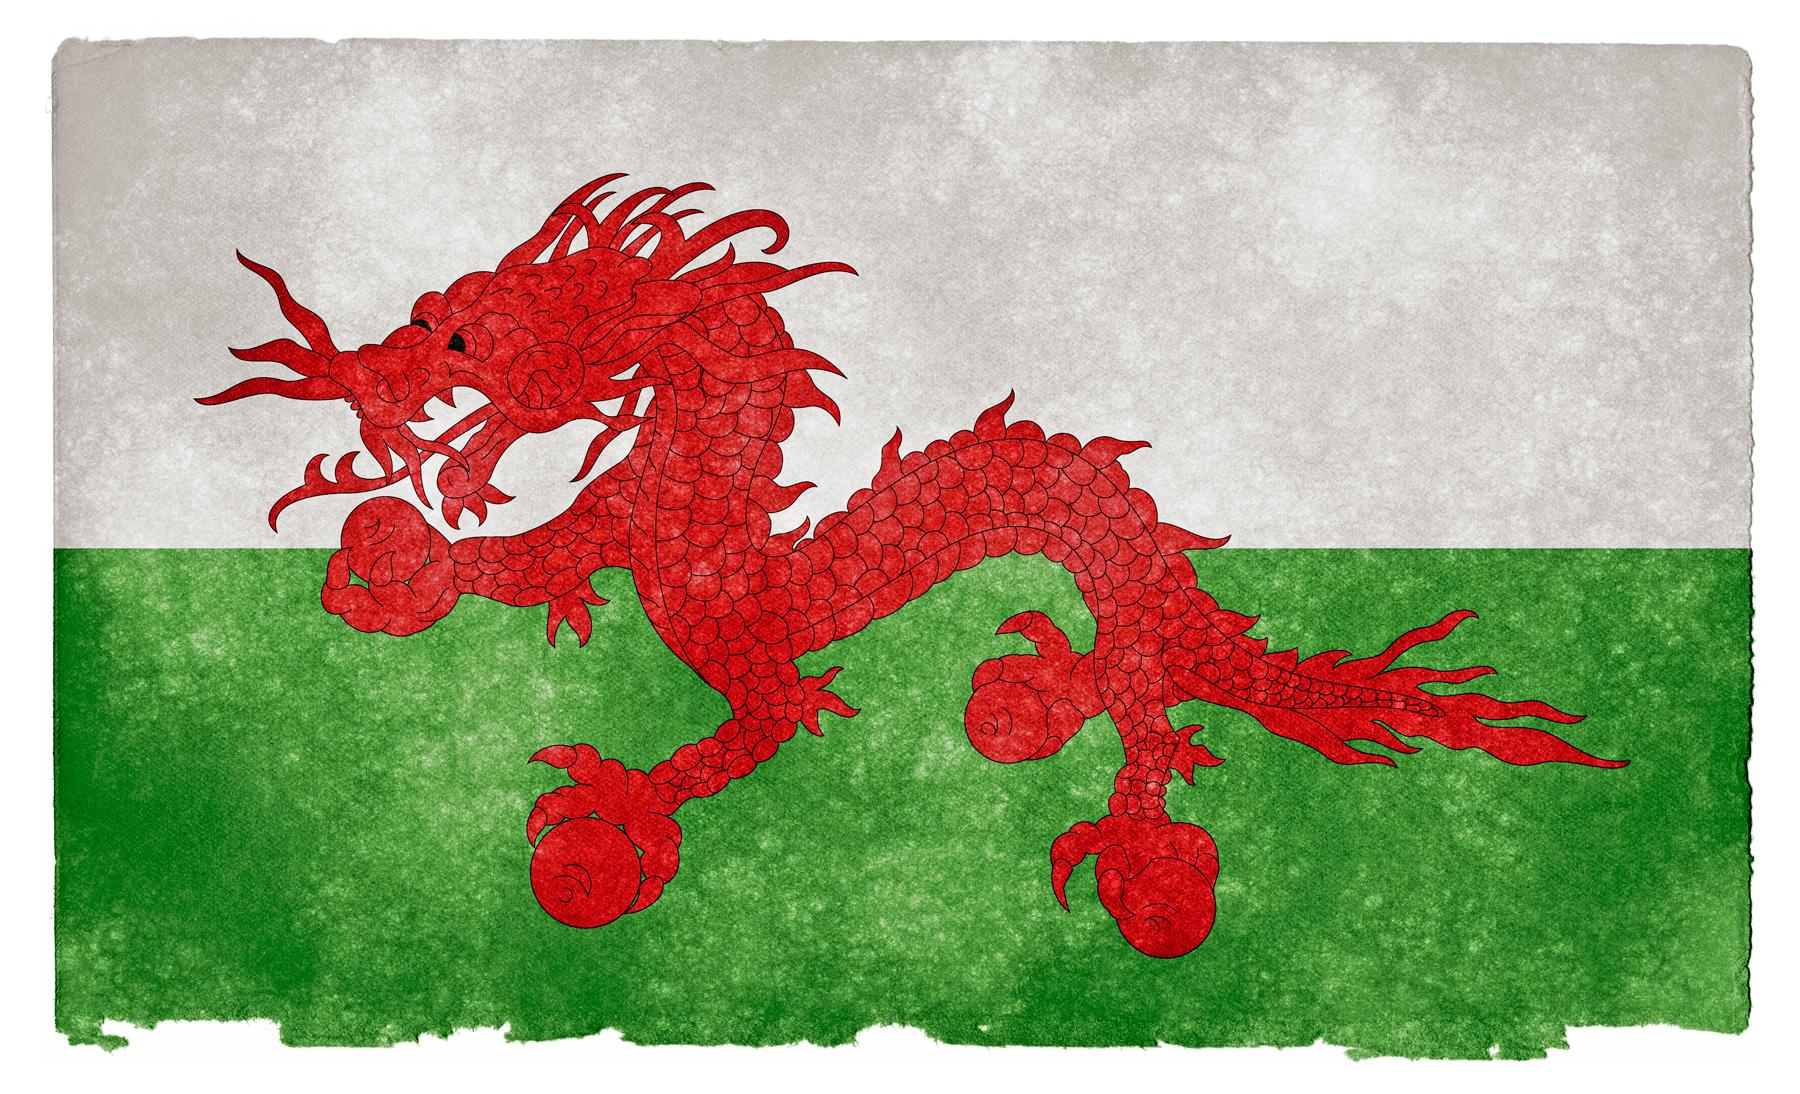 Asian Welsh Grunge Flag, Aged, Mythological, Parchment, Paper, HQ Photo